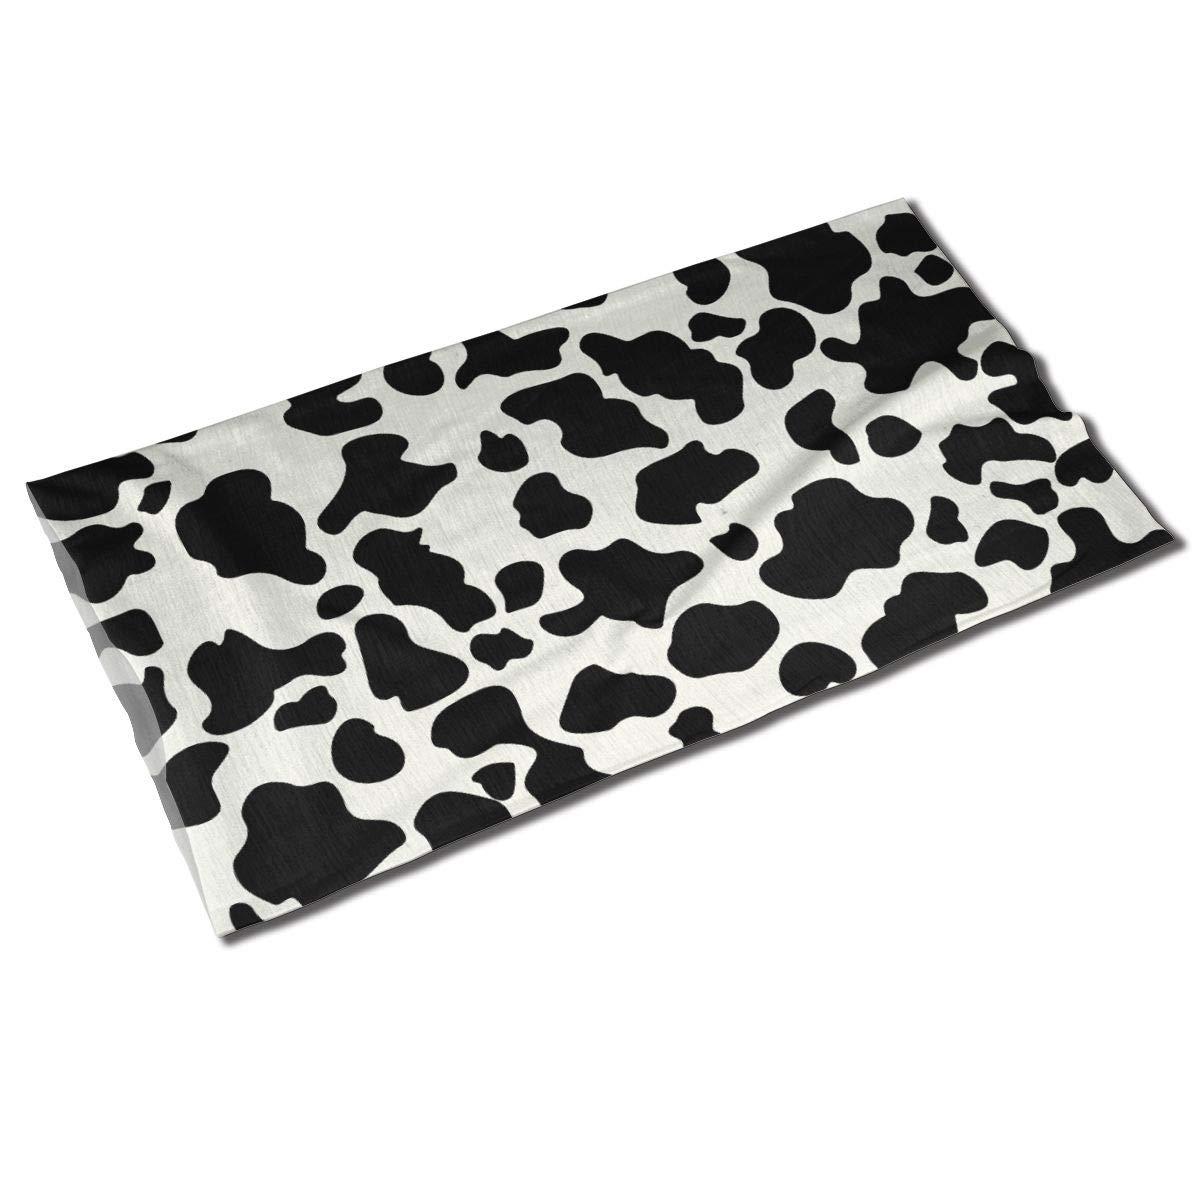 Cow Print Unisex Outdoor Sport Scarf Headbands Bandana Mask Neck Gaiter Head Wrap Sweatband Headwear